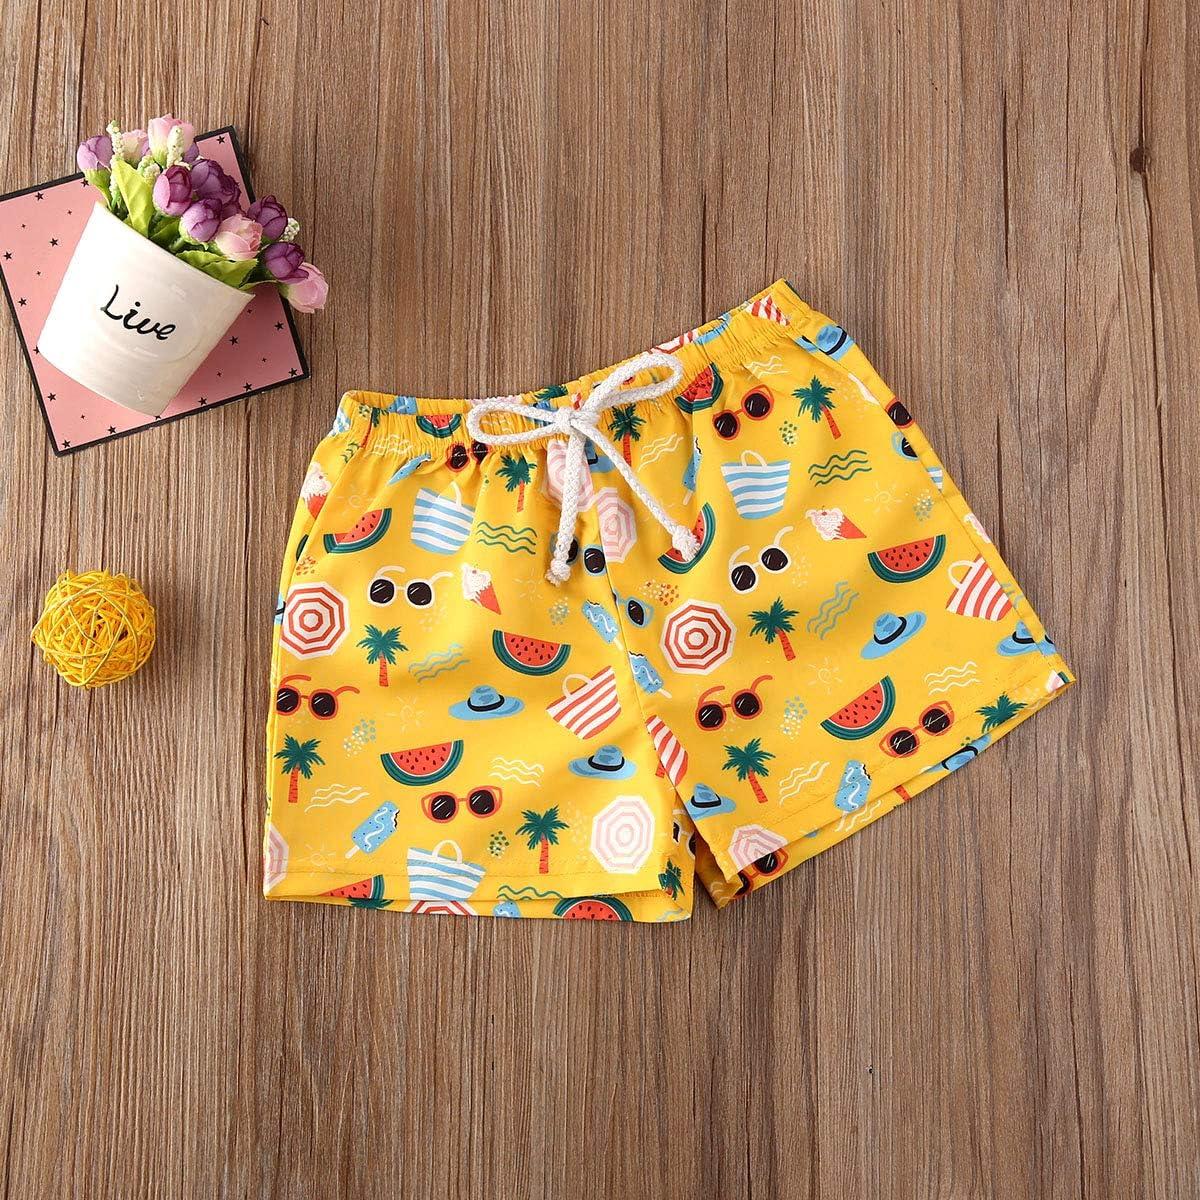 pengnight Toddler Baby Boy Hawaiian Beach Shorts Pineapple Leaf Print Swim Trunks Kids Broad Shorts Surf Swimwear